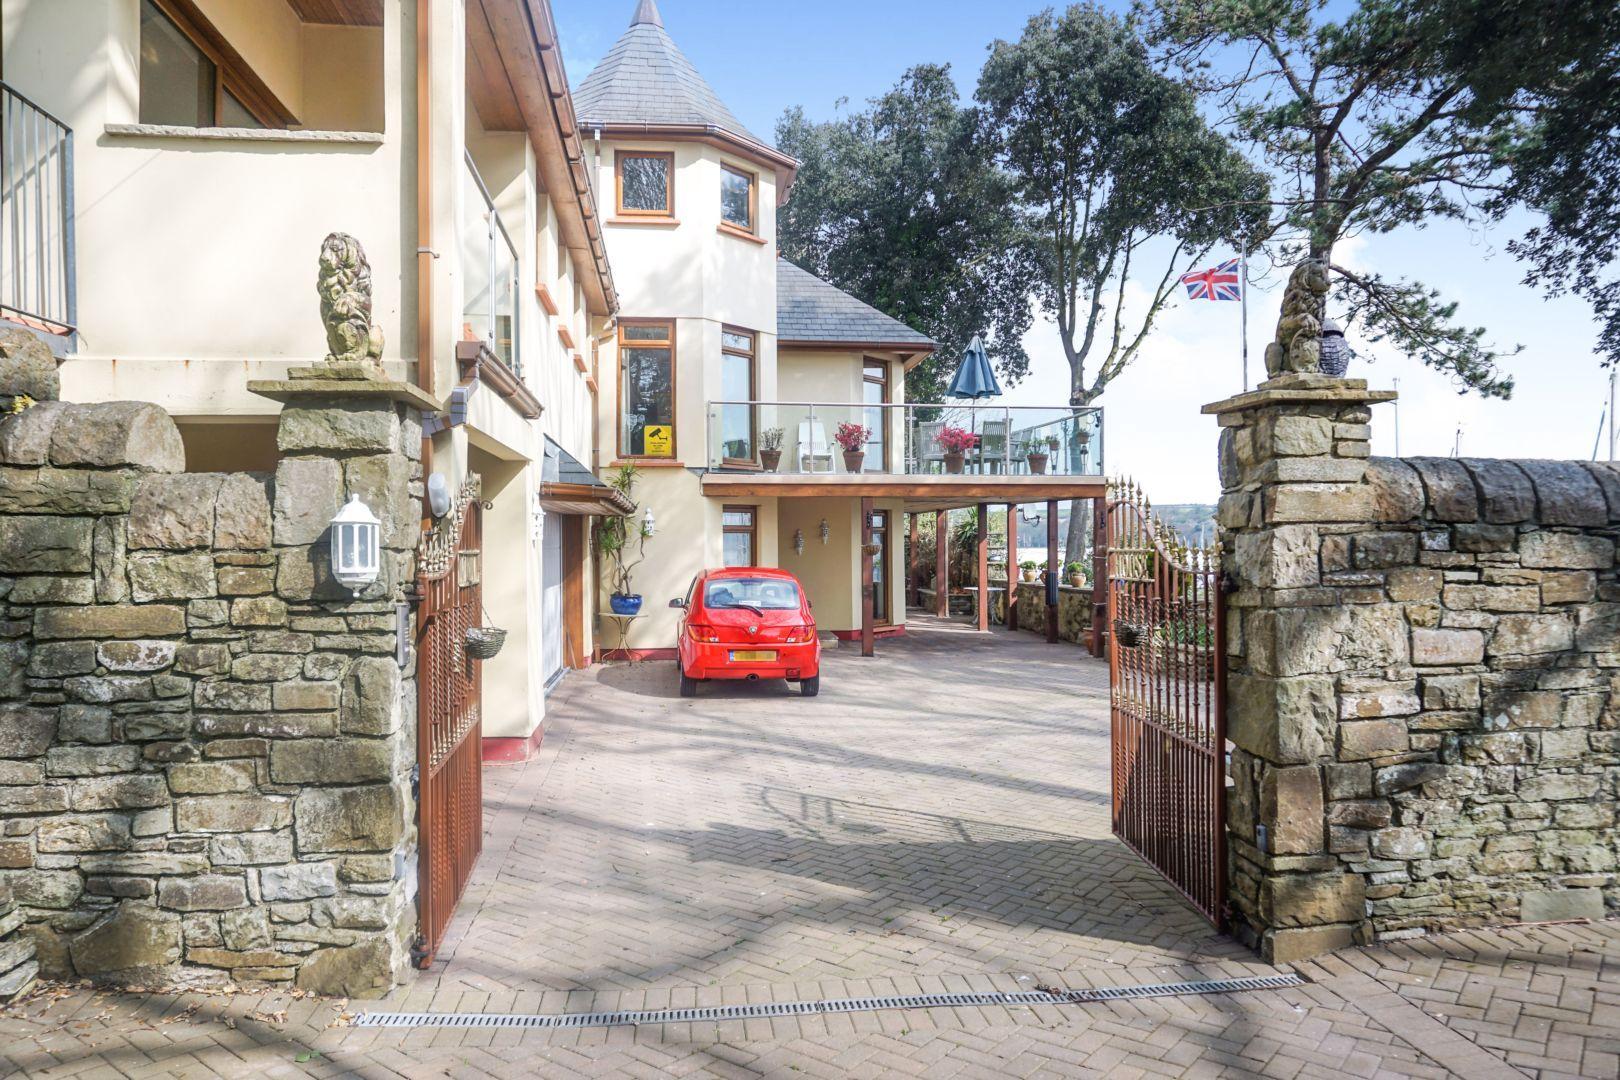 Property photo 1 of 26. Gated Entrance